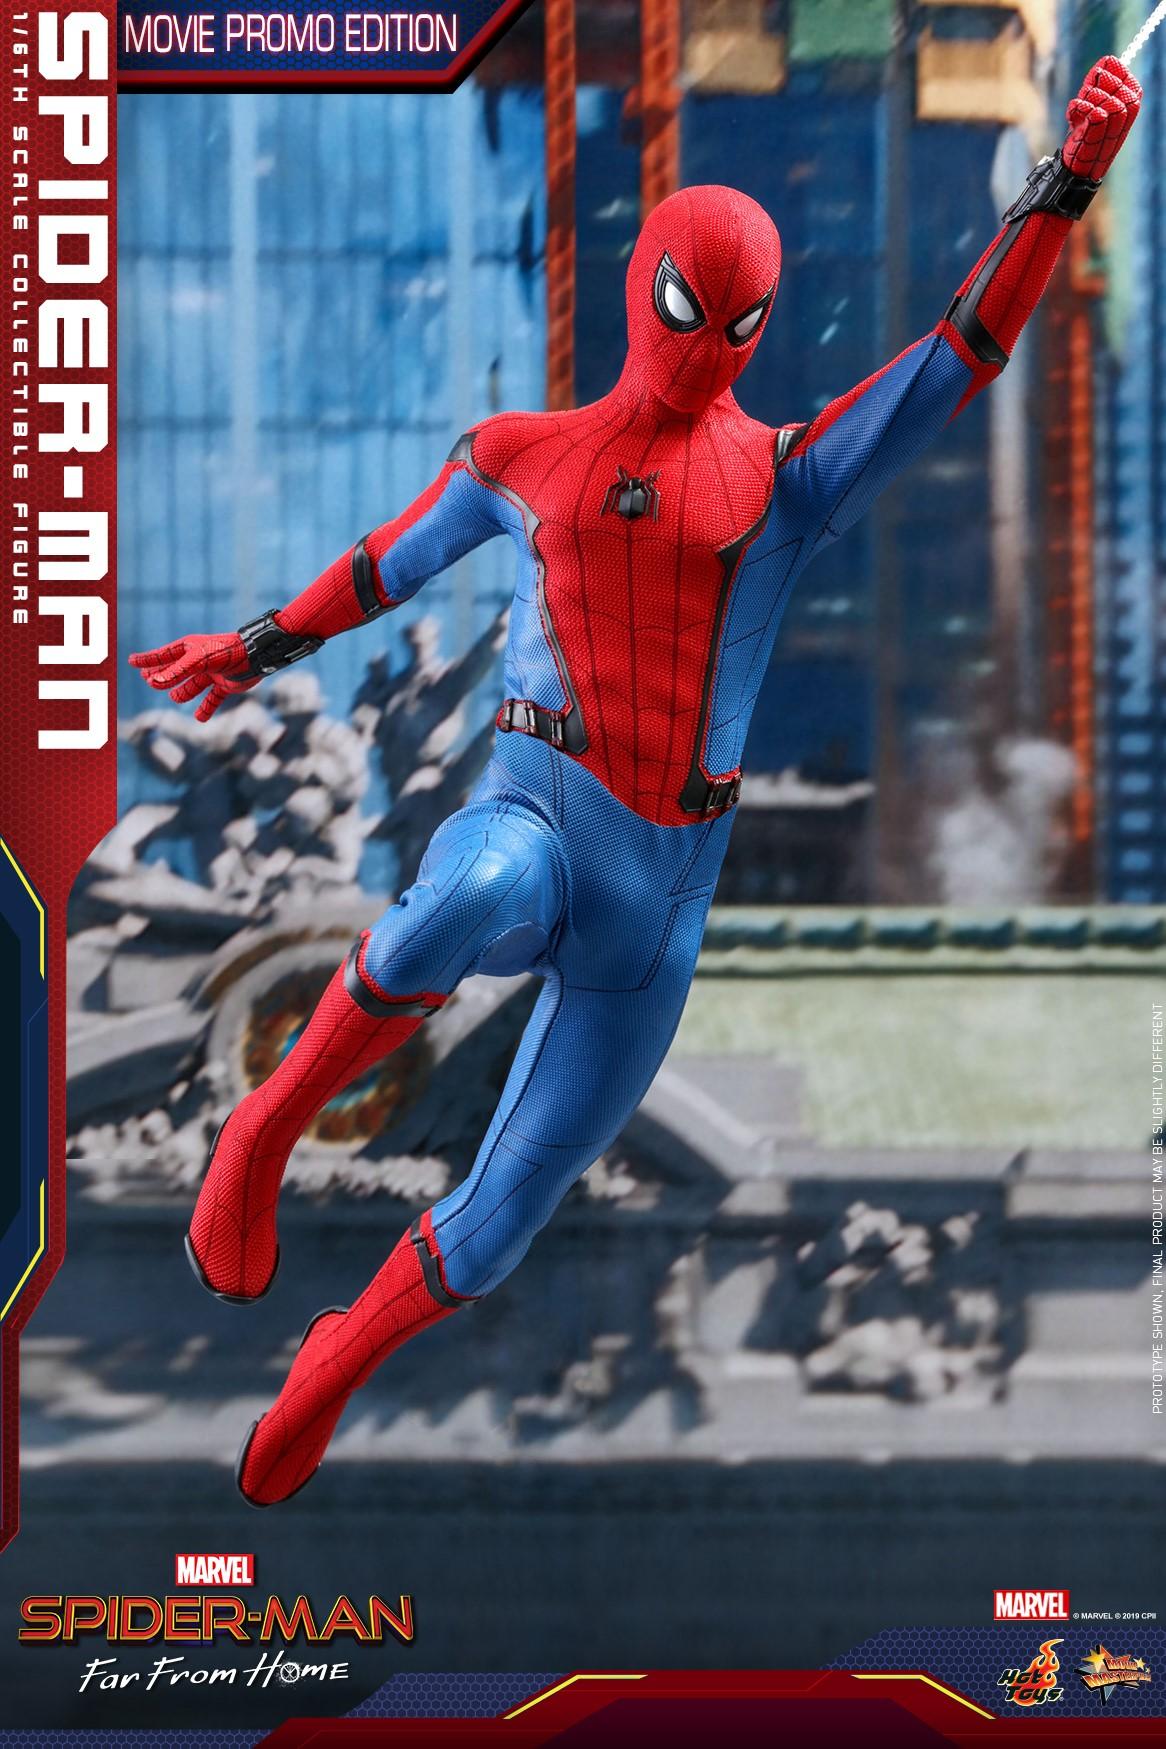 Hot Toys Movie Promo Spider-Man Reissue 16 Figure -2743